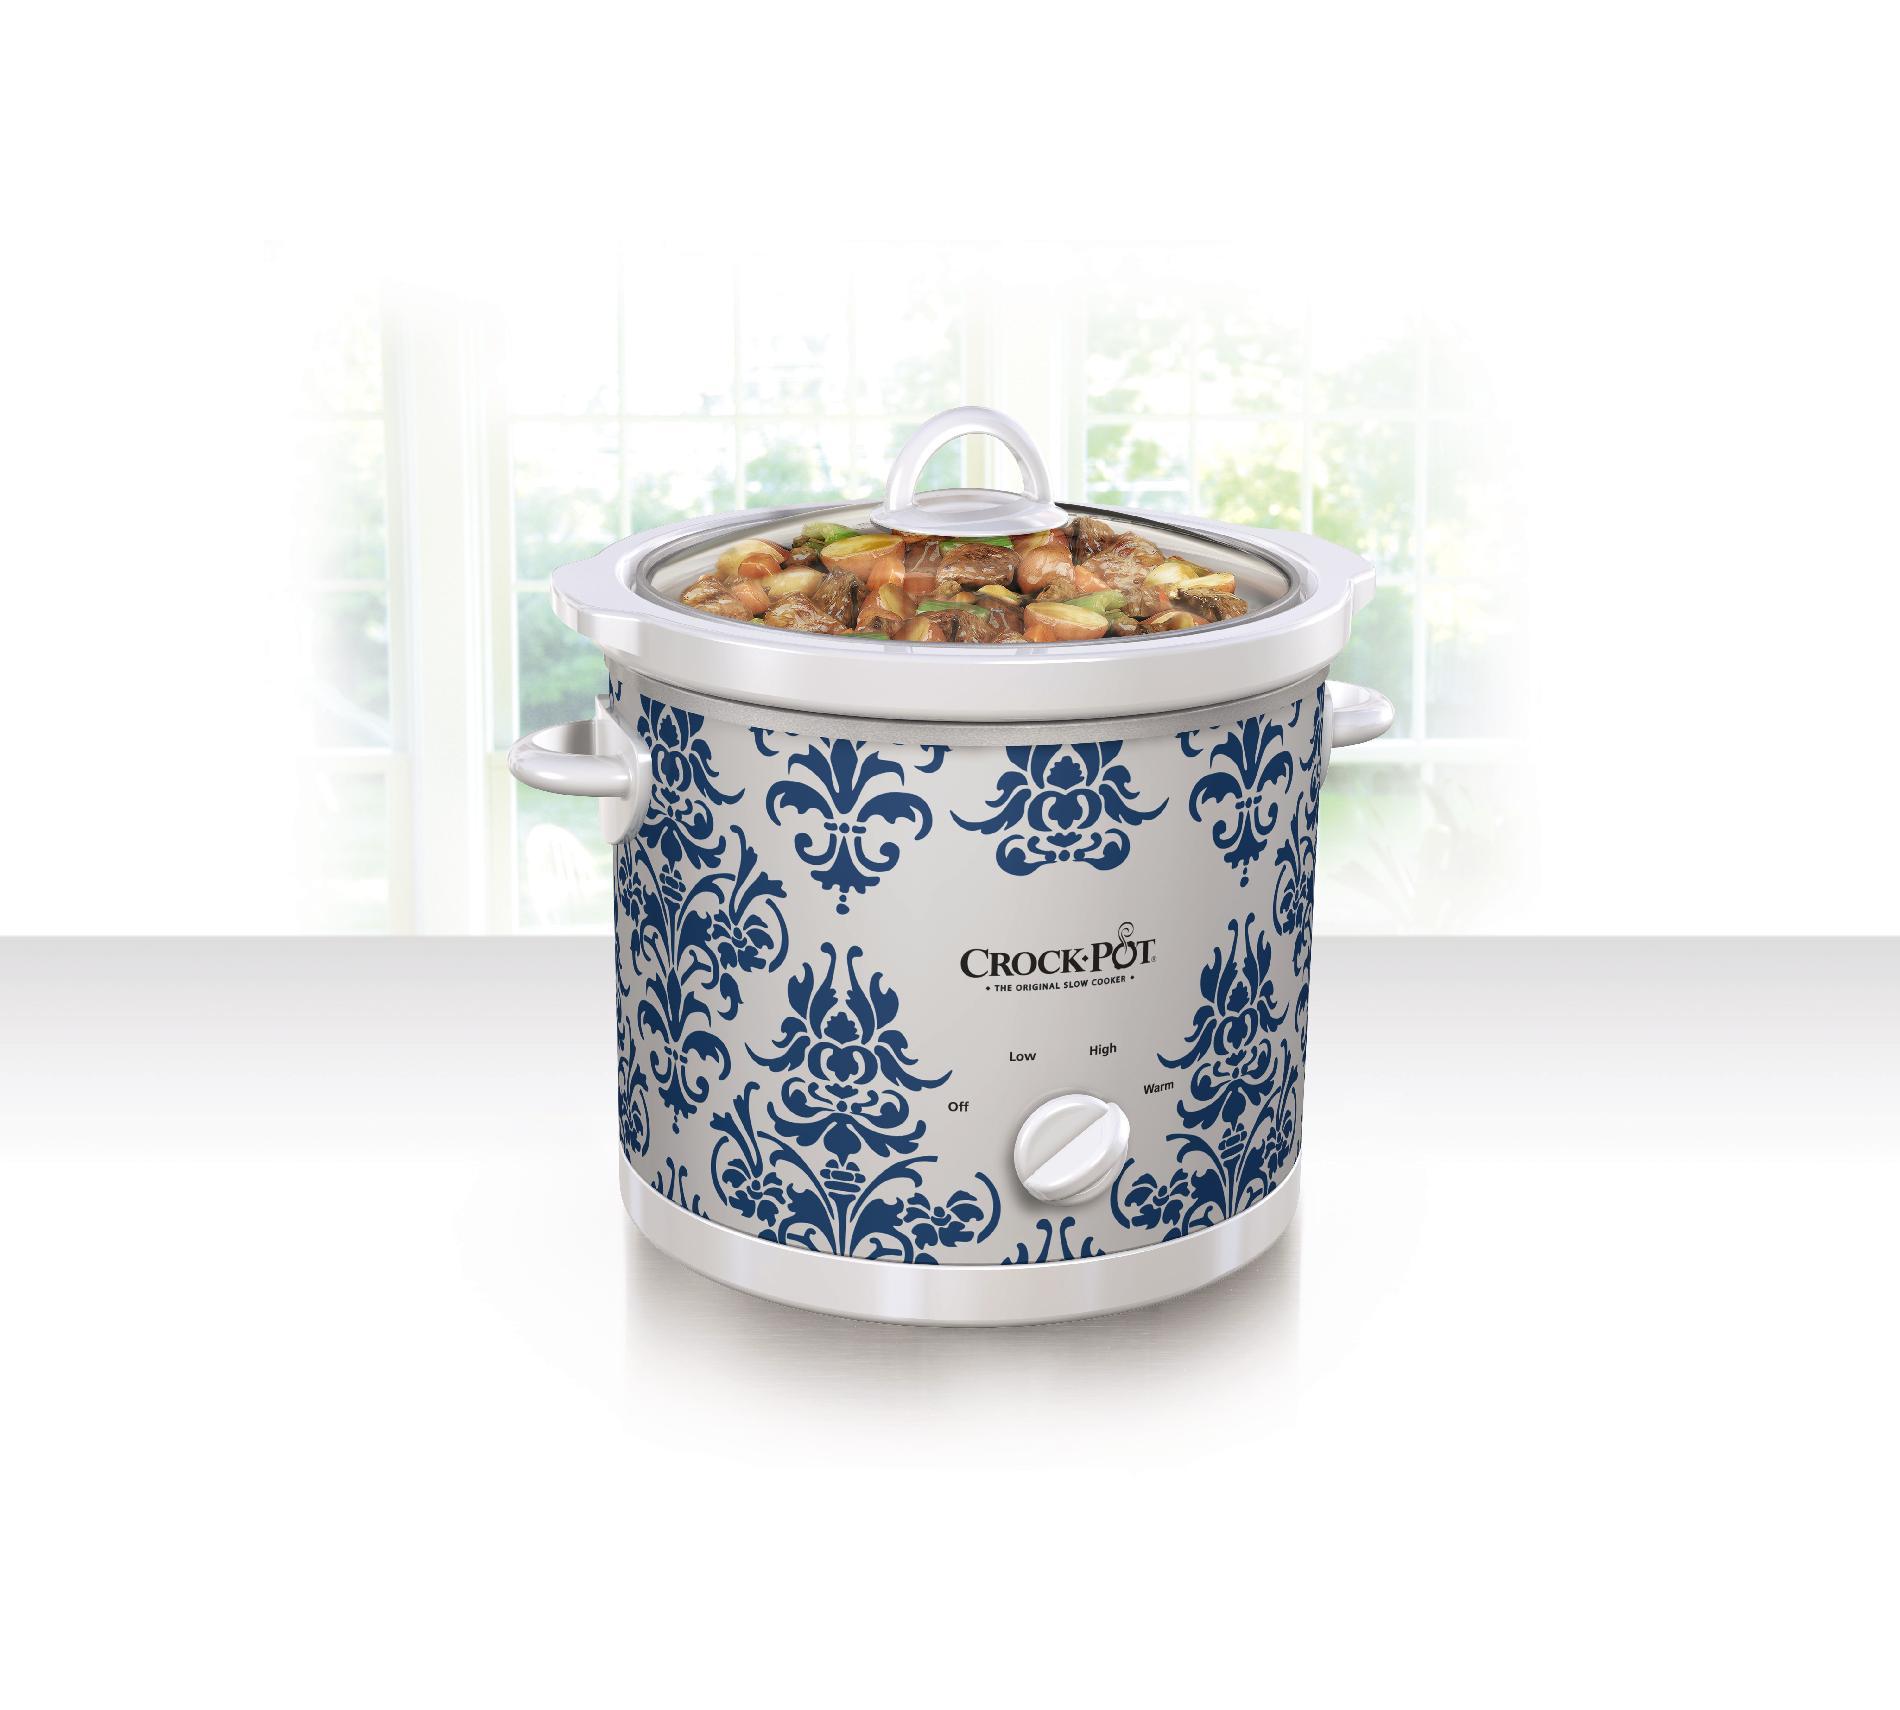 Crock Pot 3 Quart Manual Slow Cooker, Blue Damask